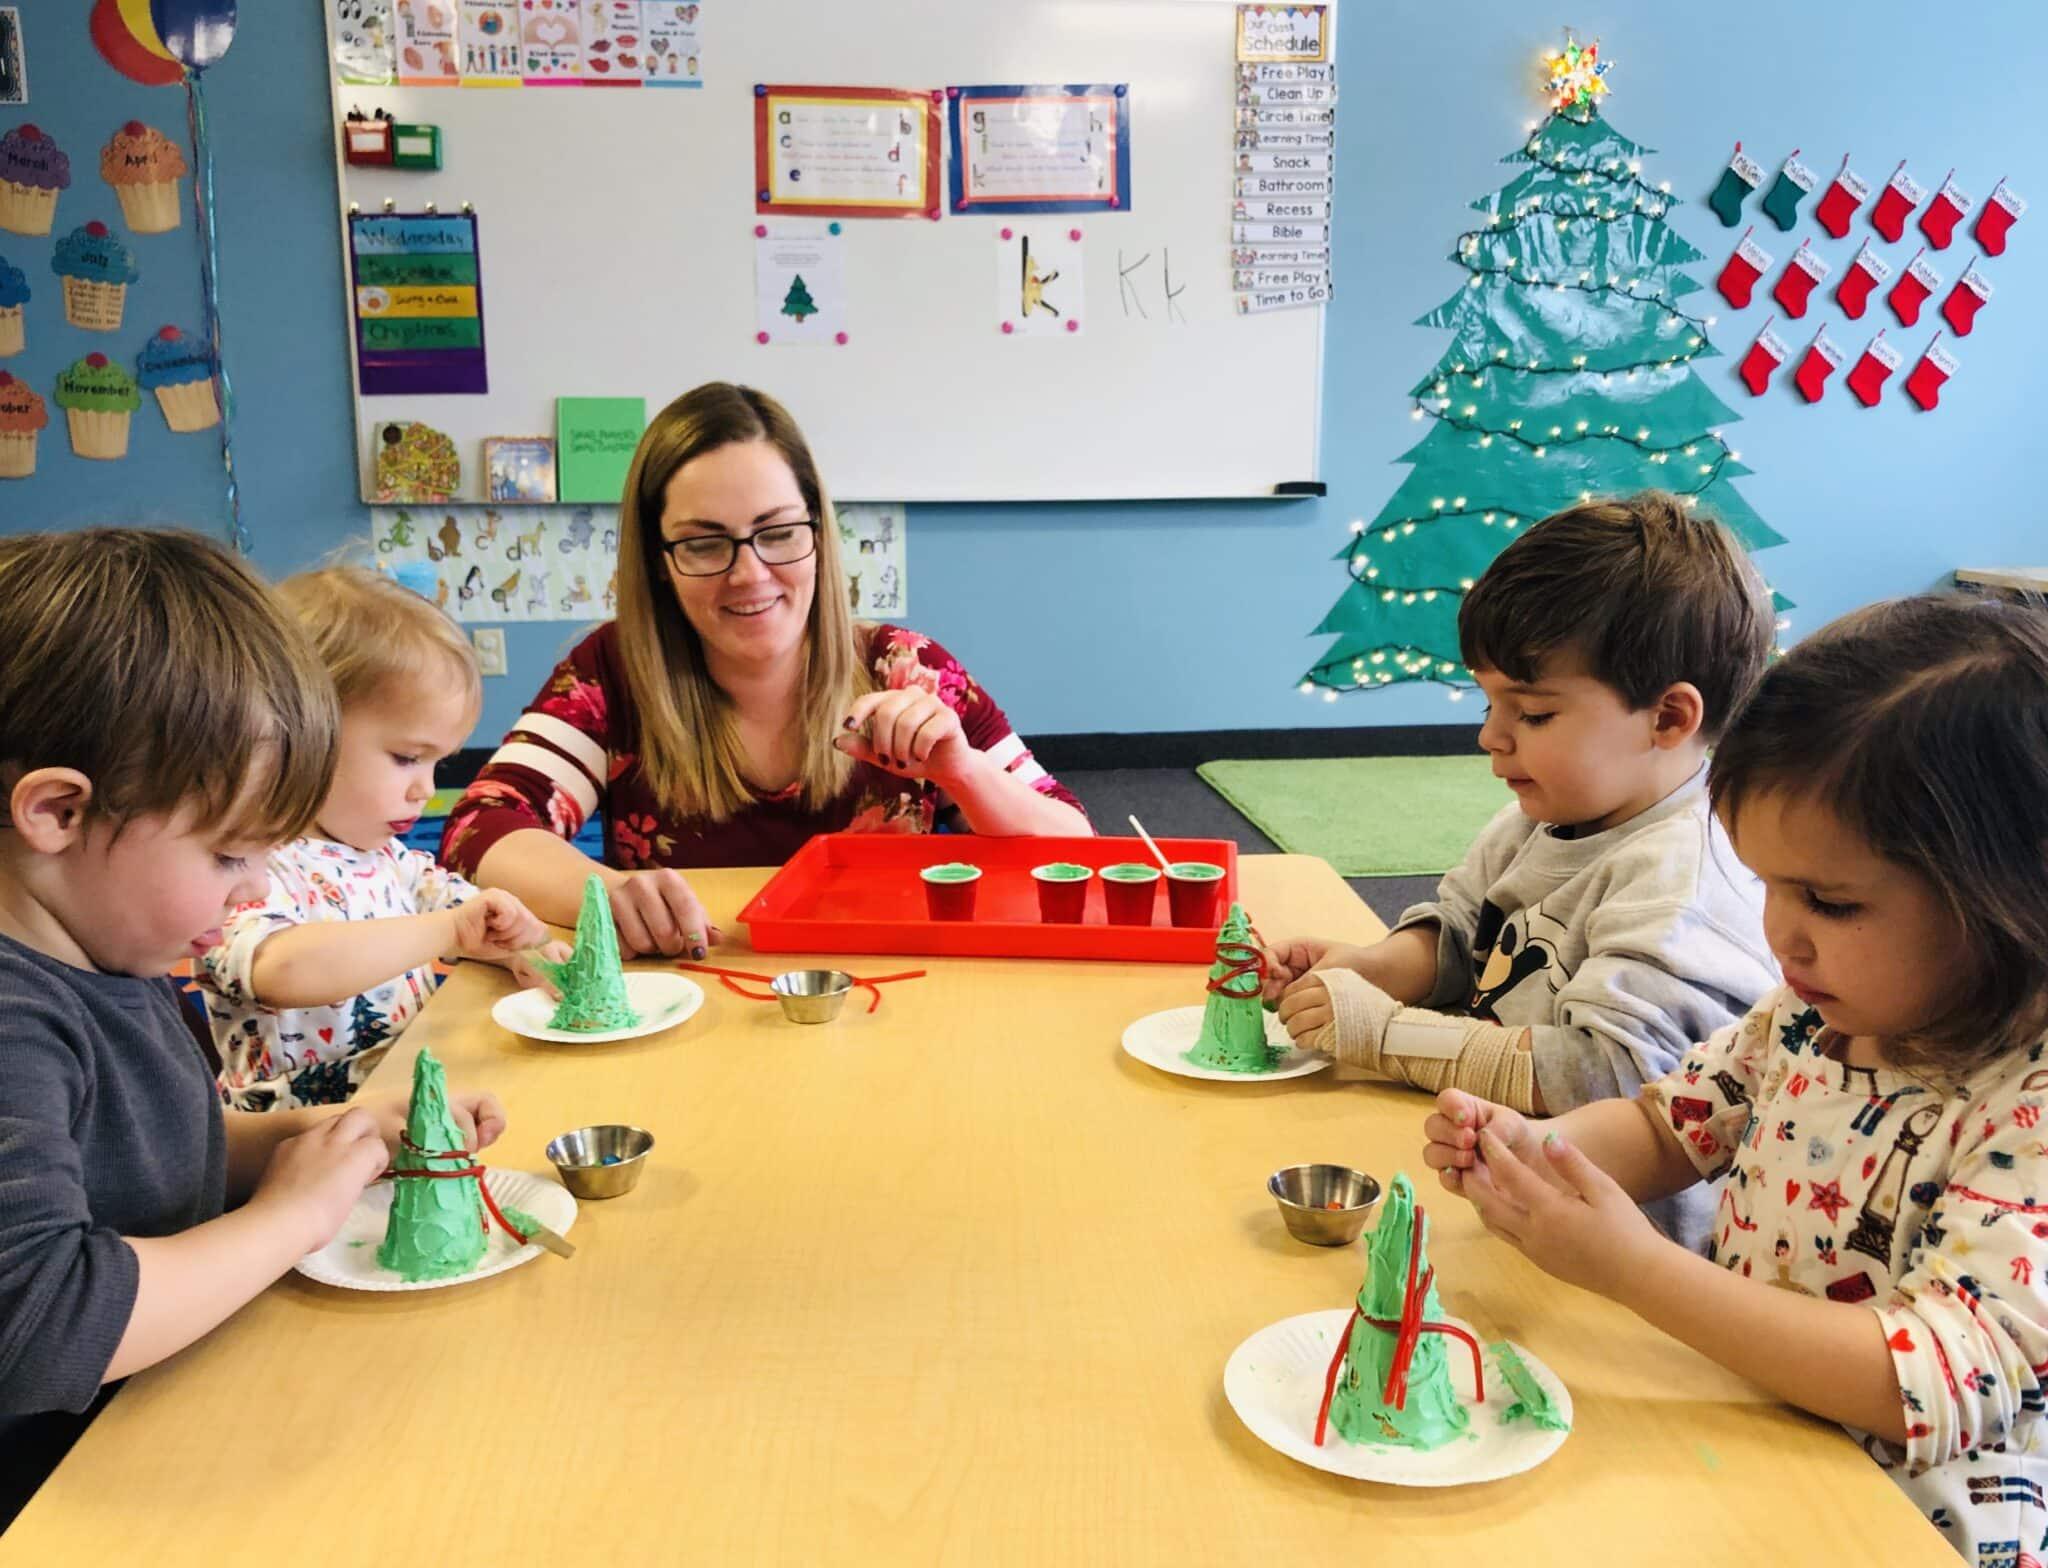 Little Sparrows Beginner's Program at Selah Early Learning Academy